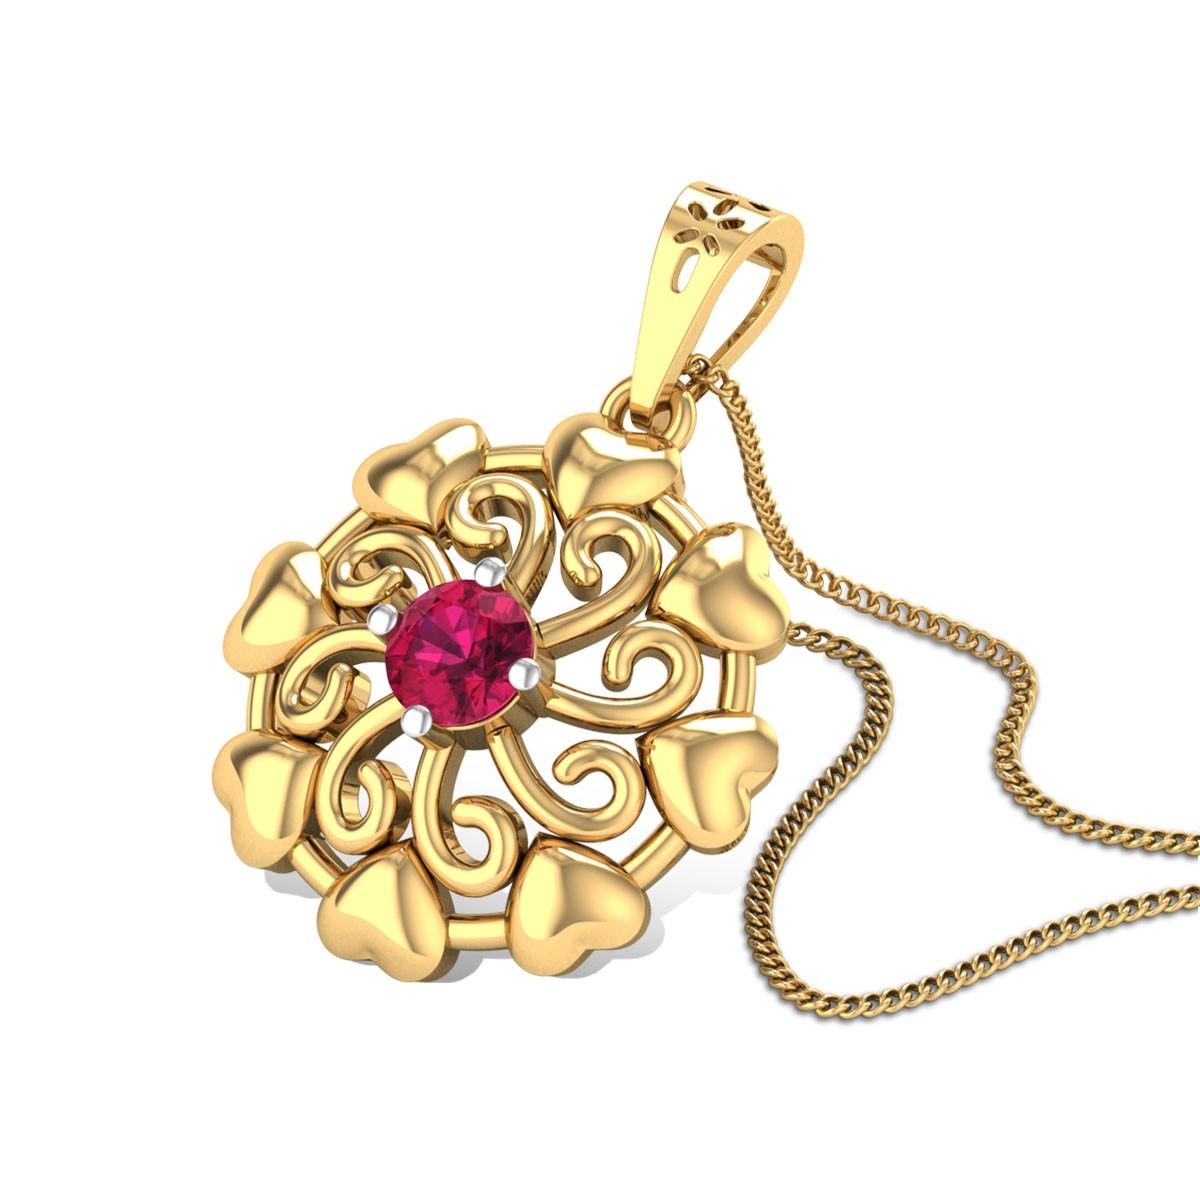 Aatreyi Ruby Floral Pendant